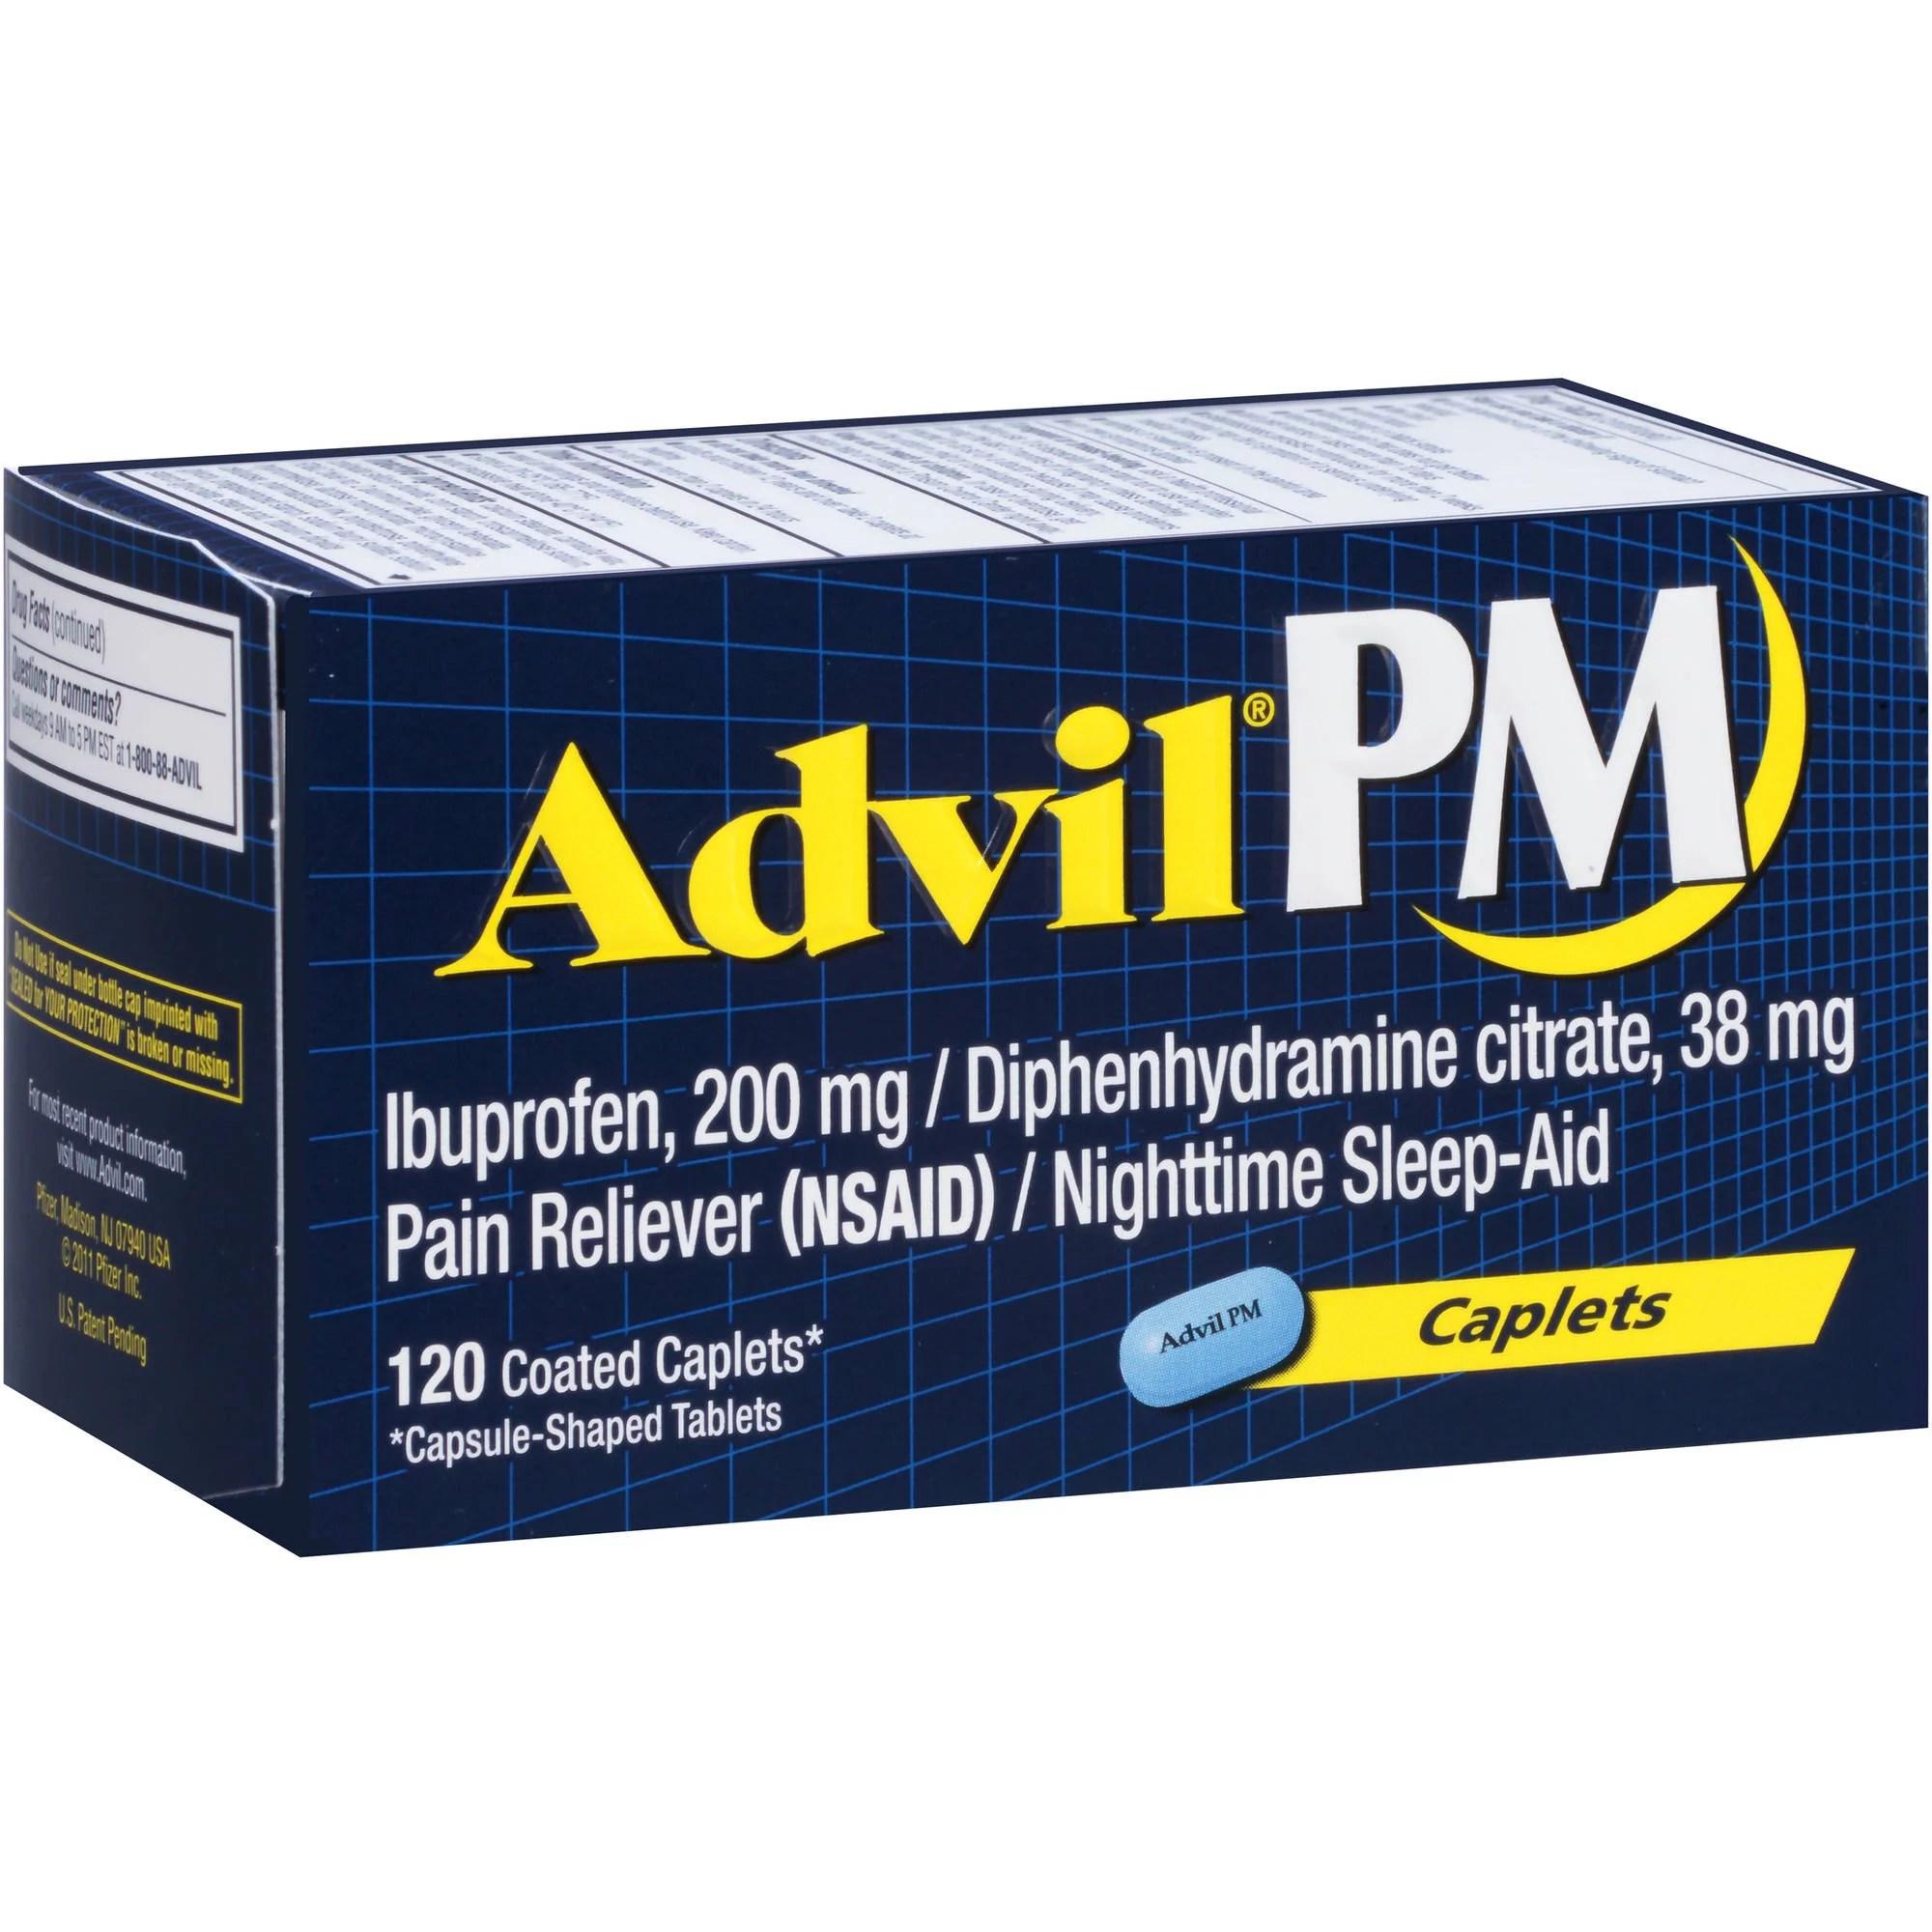 Advil PM Pain Reliever / Nighttime Sleep Aid (Ibuprofen ...